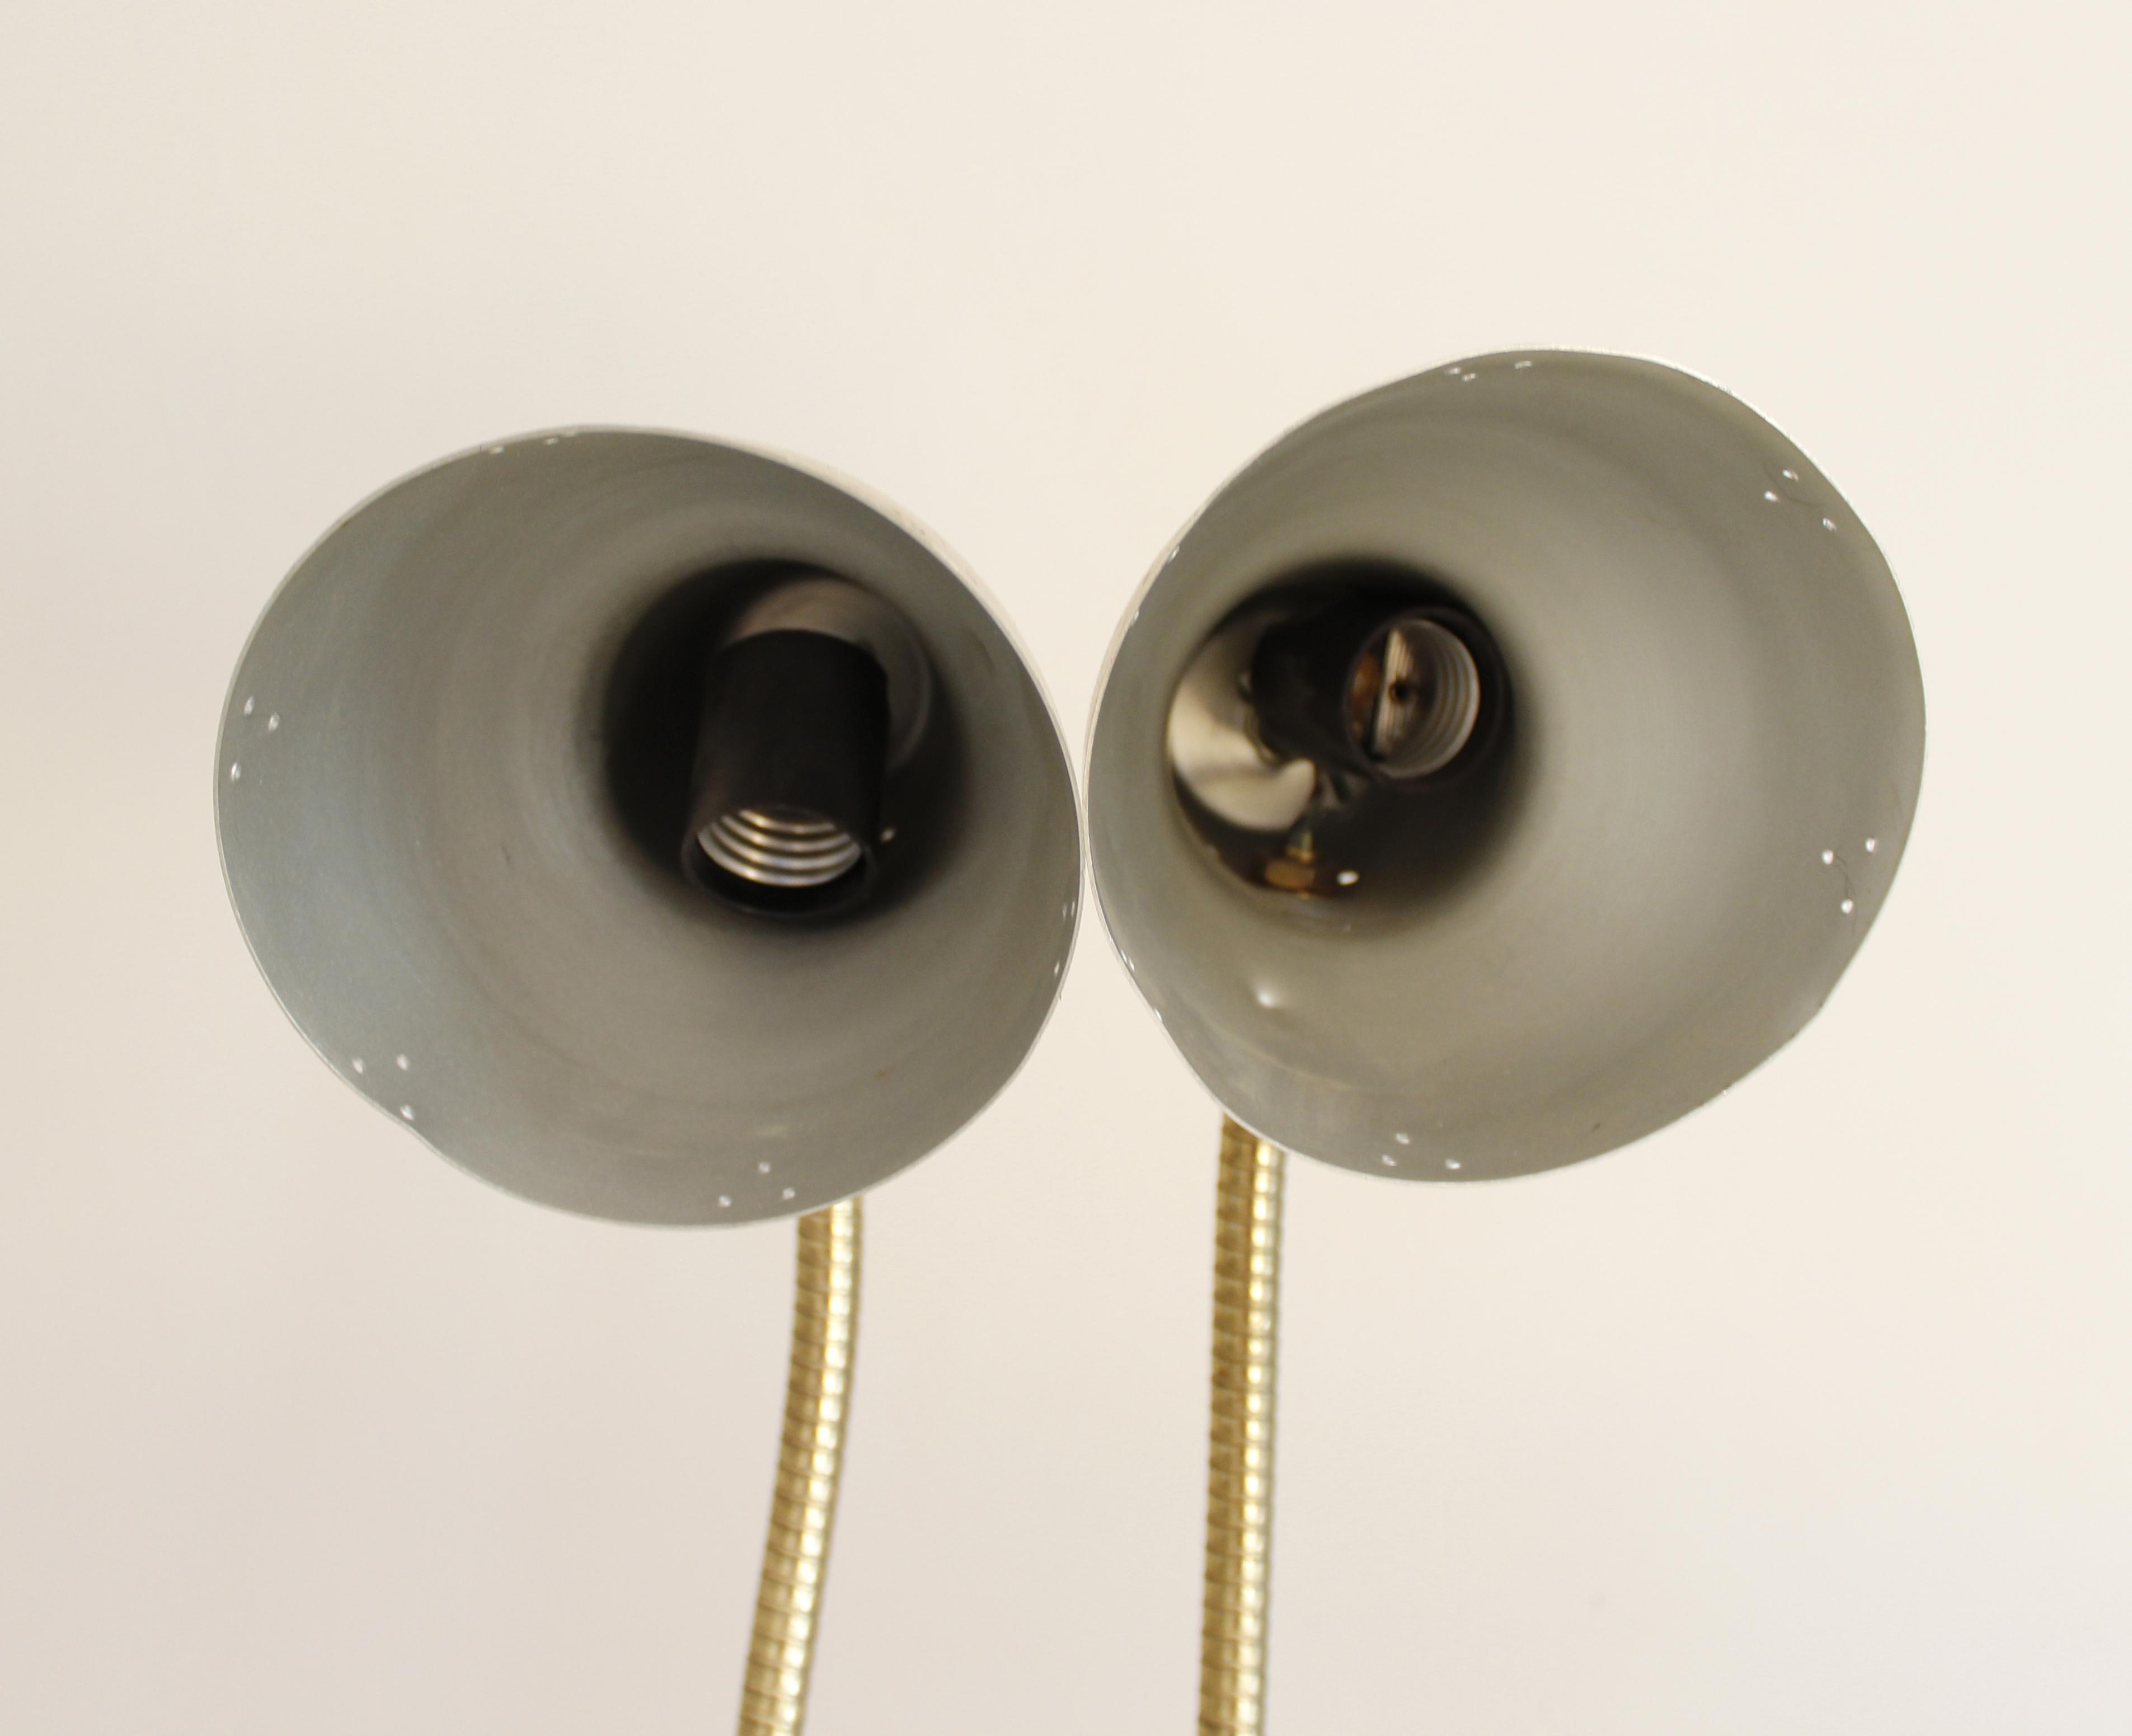 Vintage Brass Gooseneck Desk Lamp Task Lamp Double Headed Mid